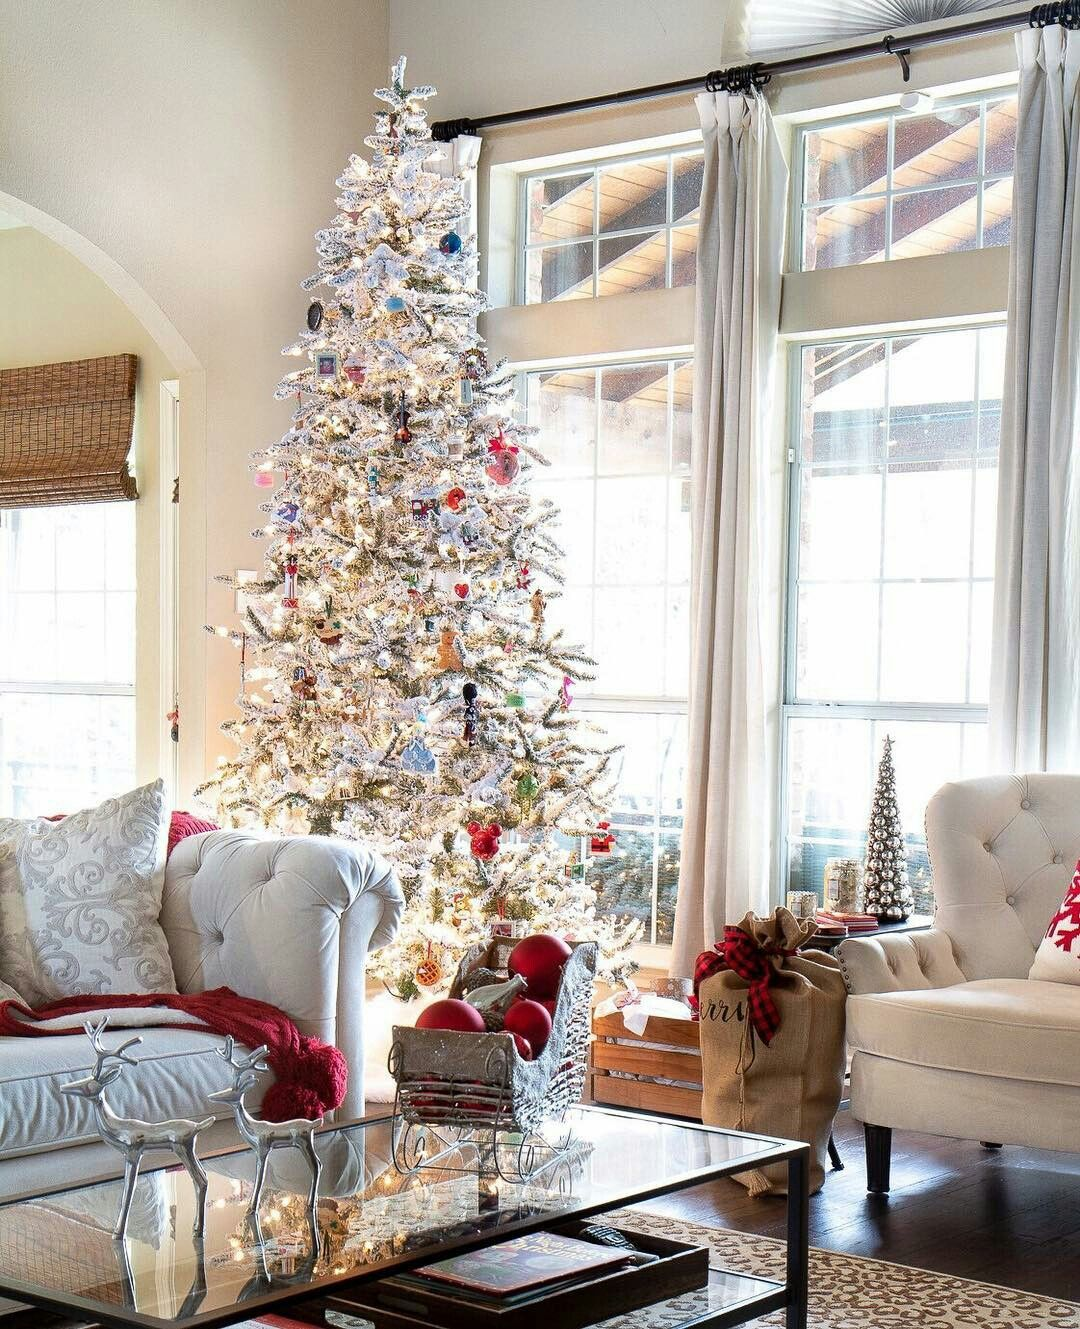 Living Room Christmas House Decorations Inside.Christmas House Decorations Inside Home Decoration